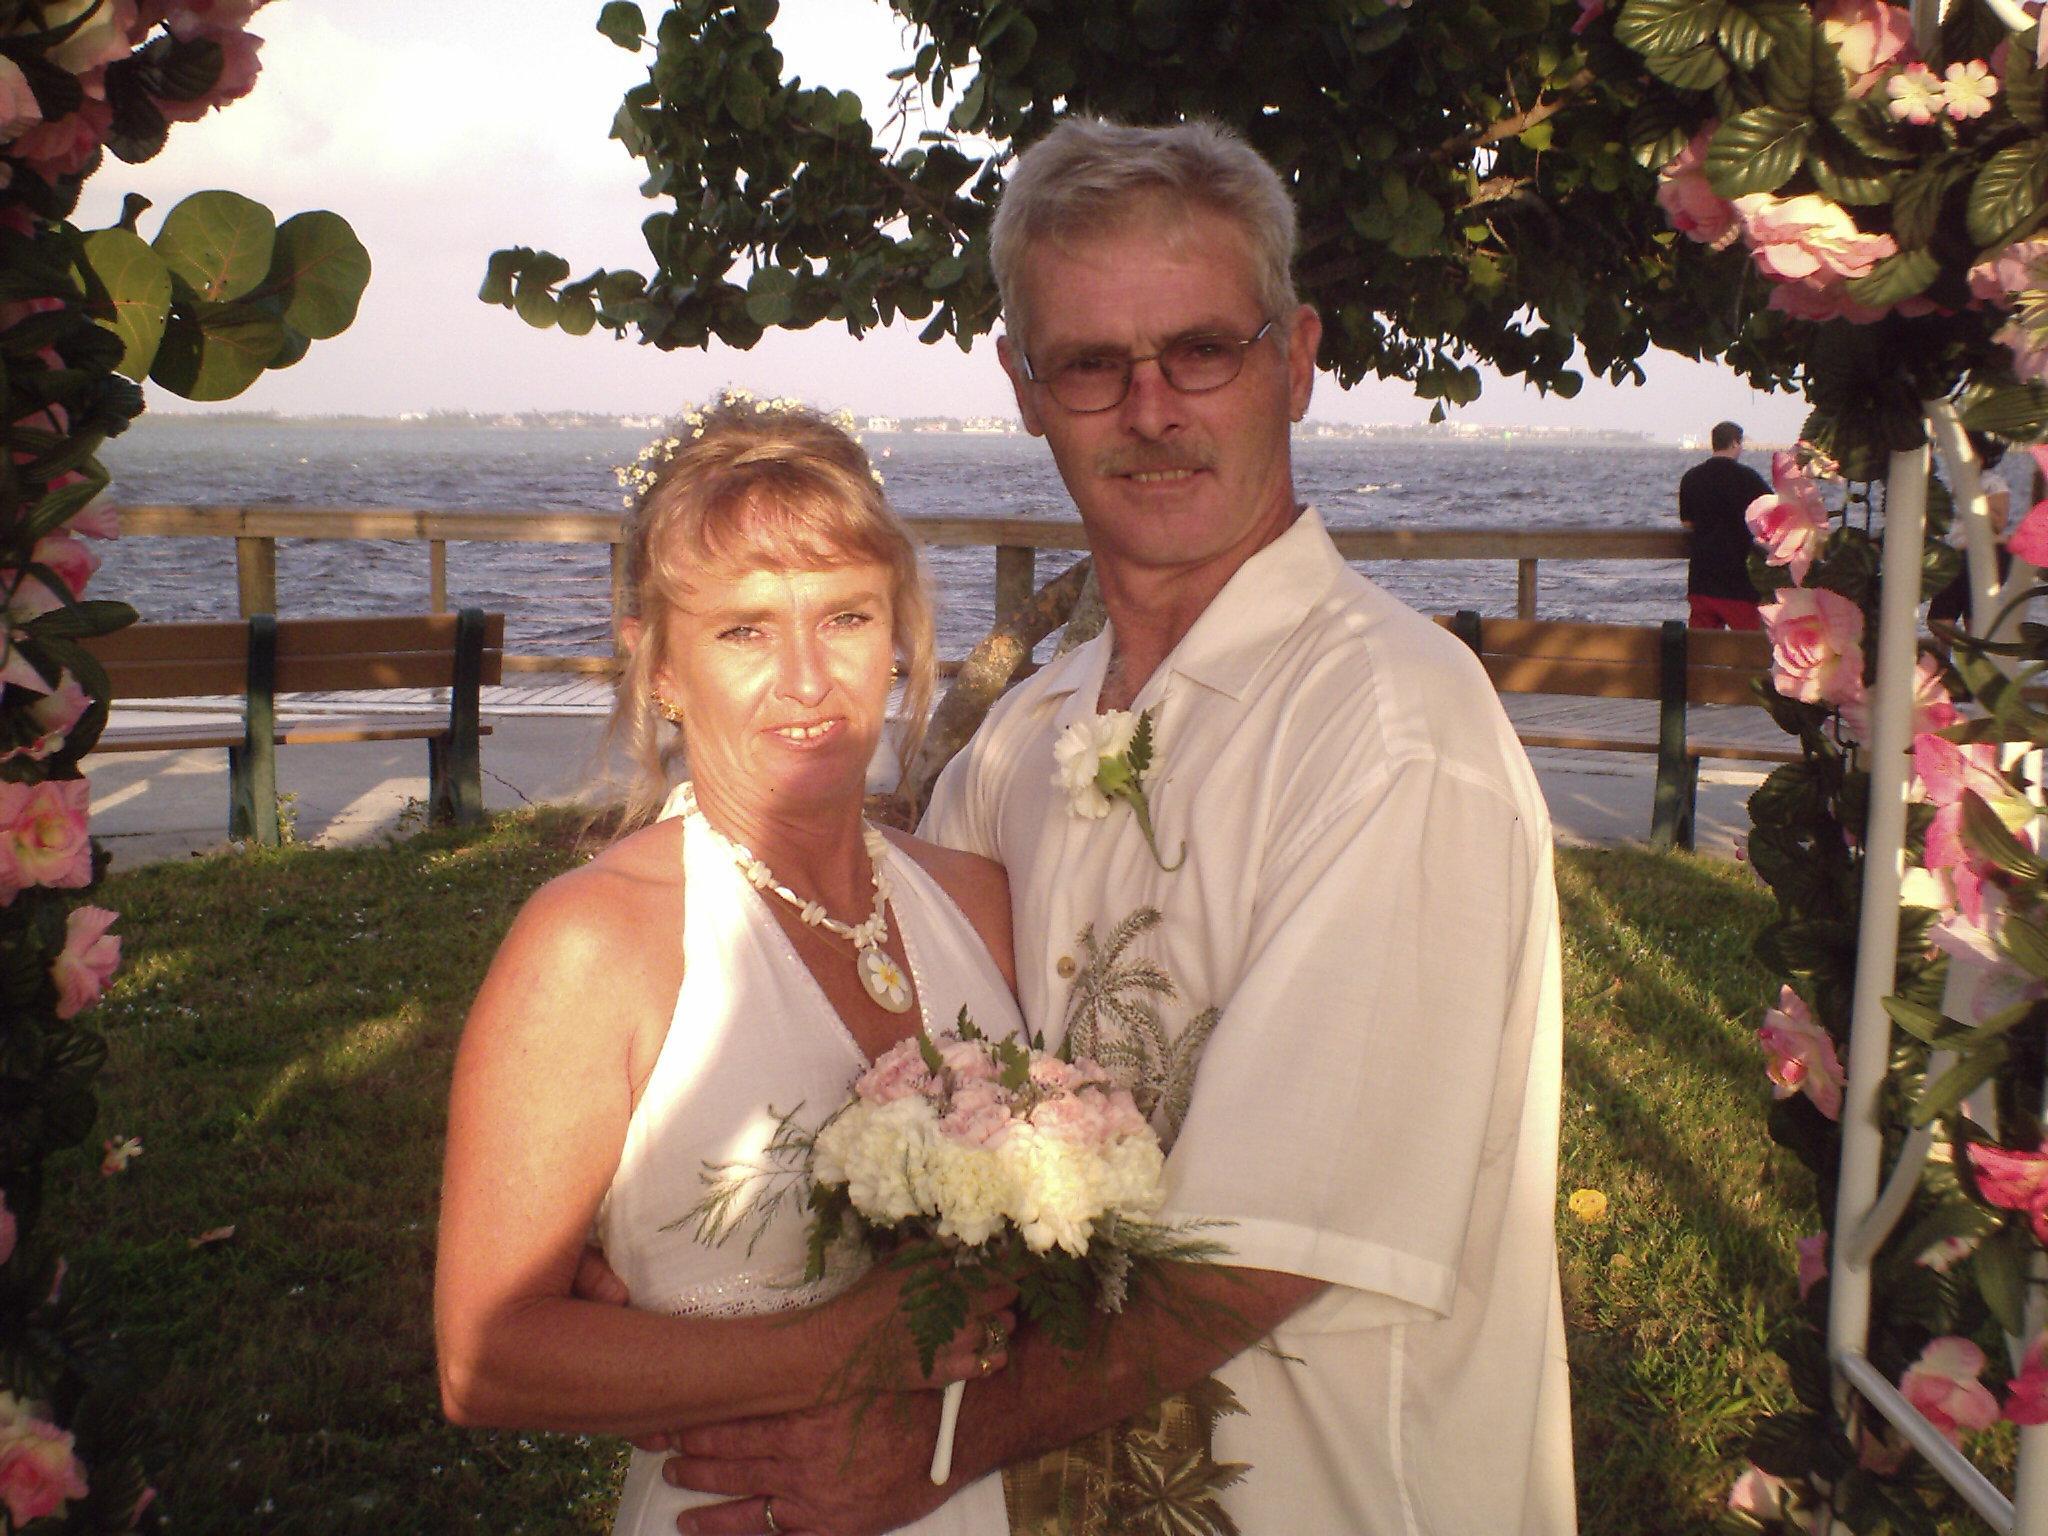 Fisher Wedding